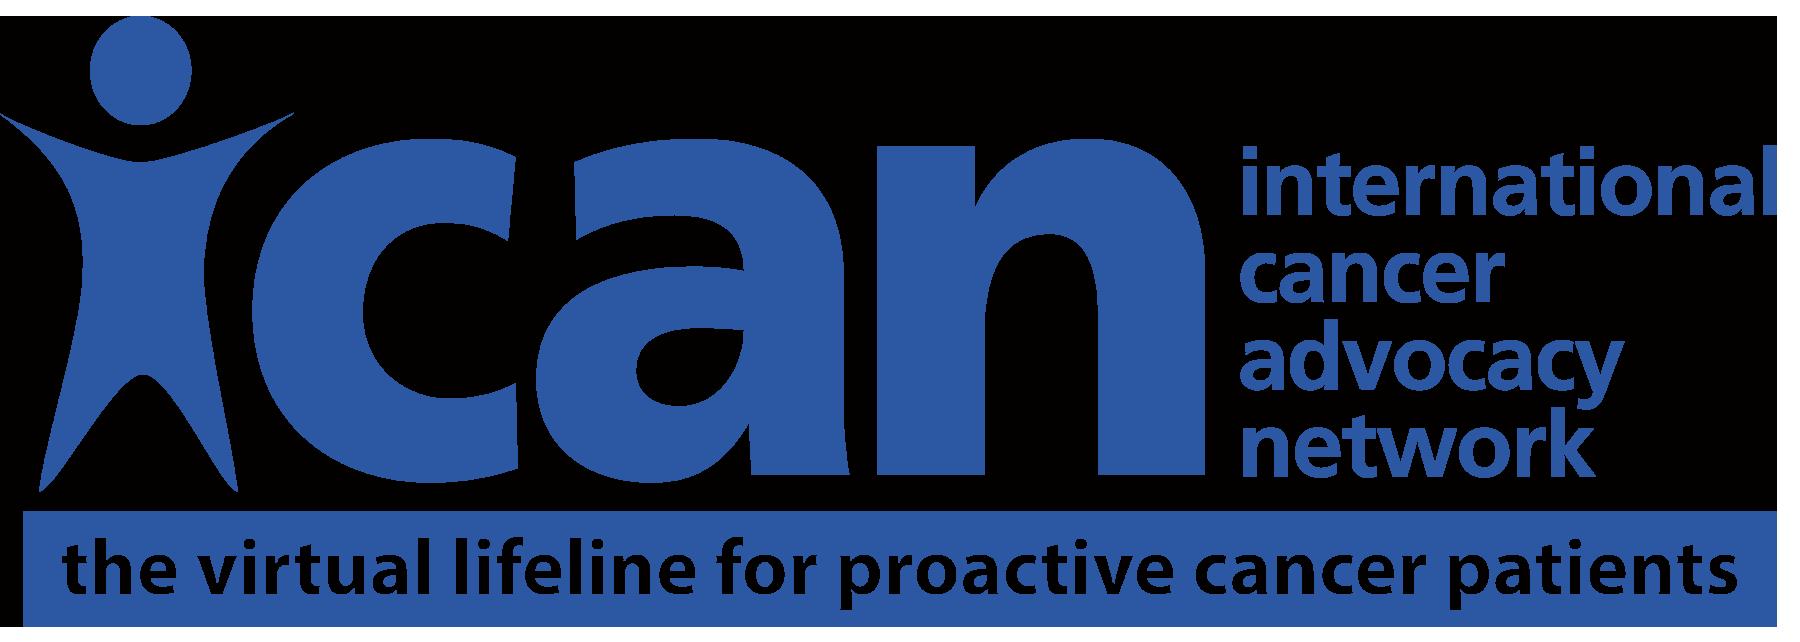 Ican logo navy 2016